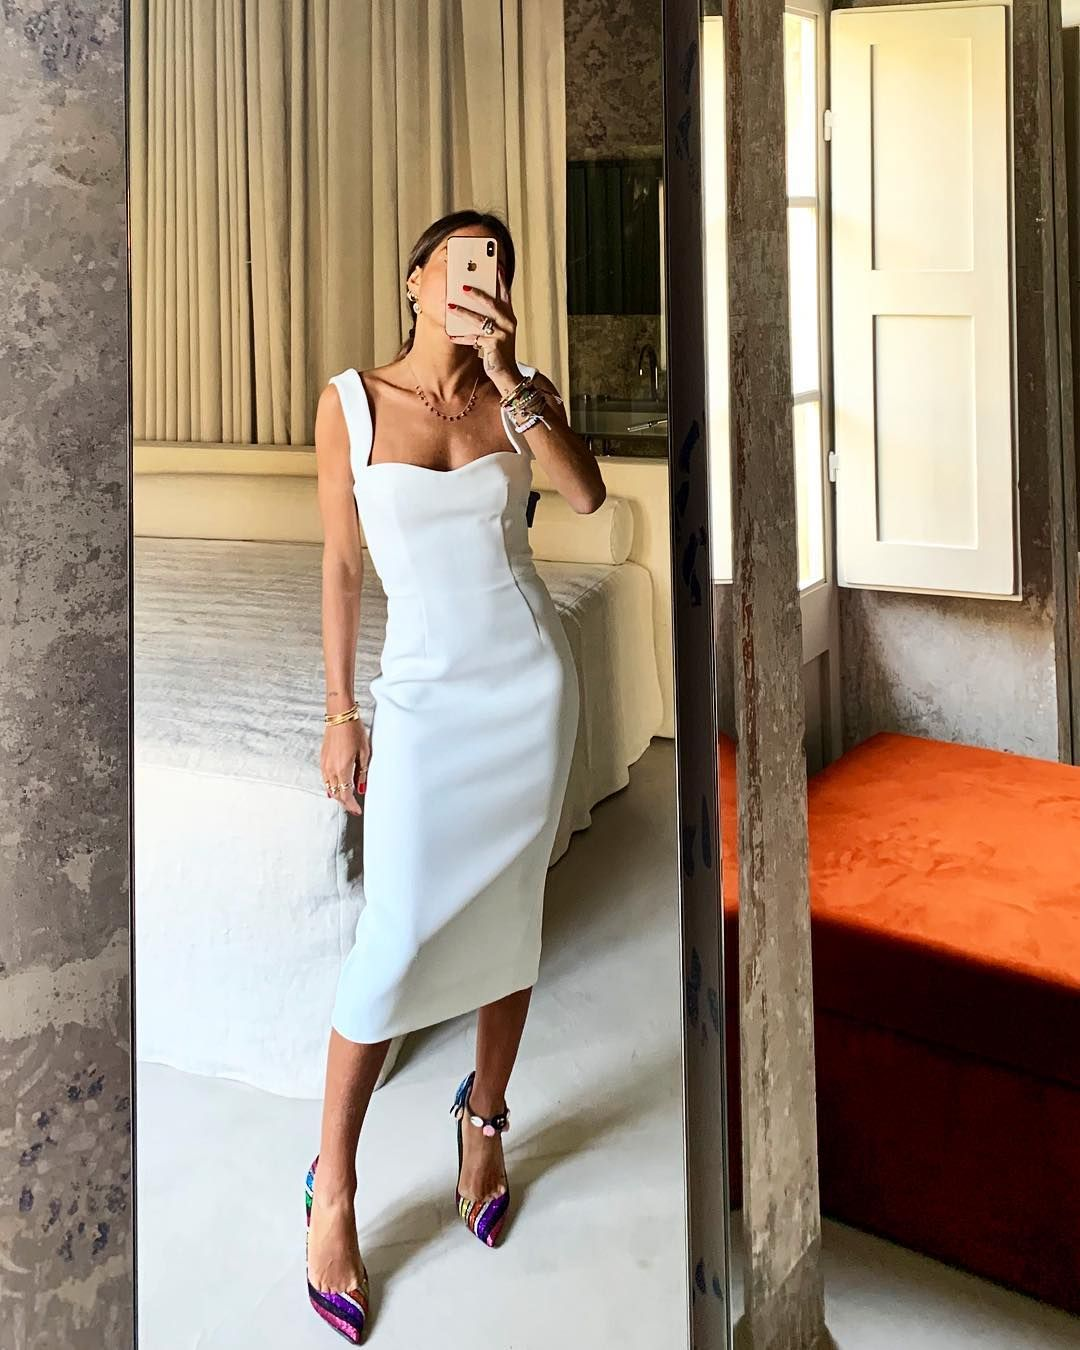 Annacarla E Simona On Instagram In My Fav Victoriabeckham White Sigarette Dress Of The Season Annacarlaesimonaxsugar Vic Fashion Womens Fashion Dresses [ 1350 x 1080 Pixel ]